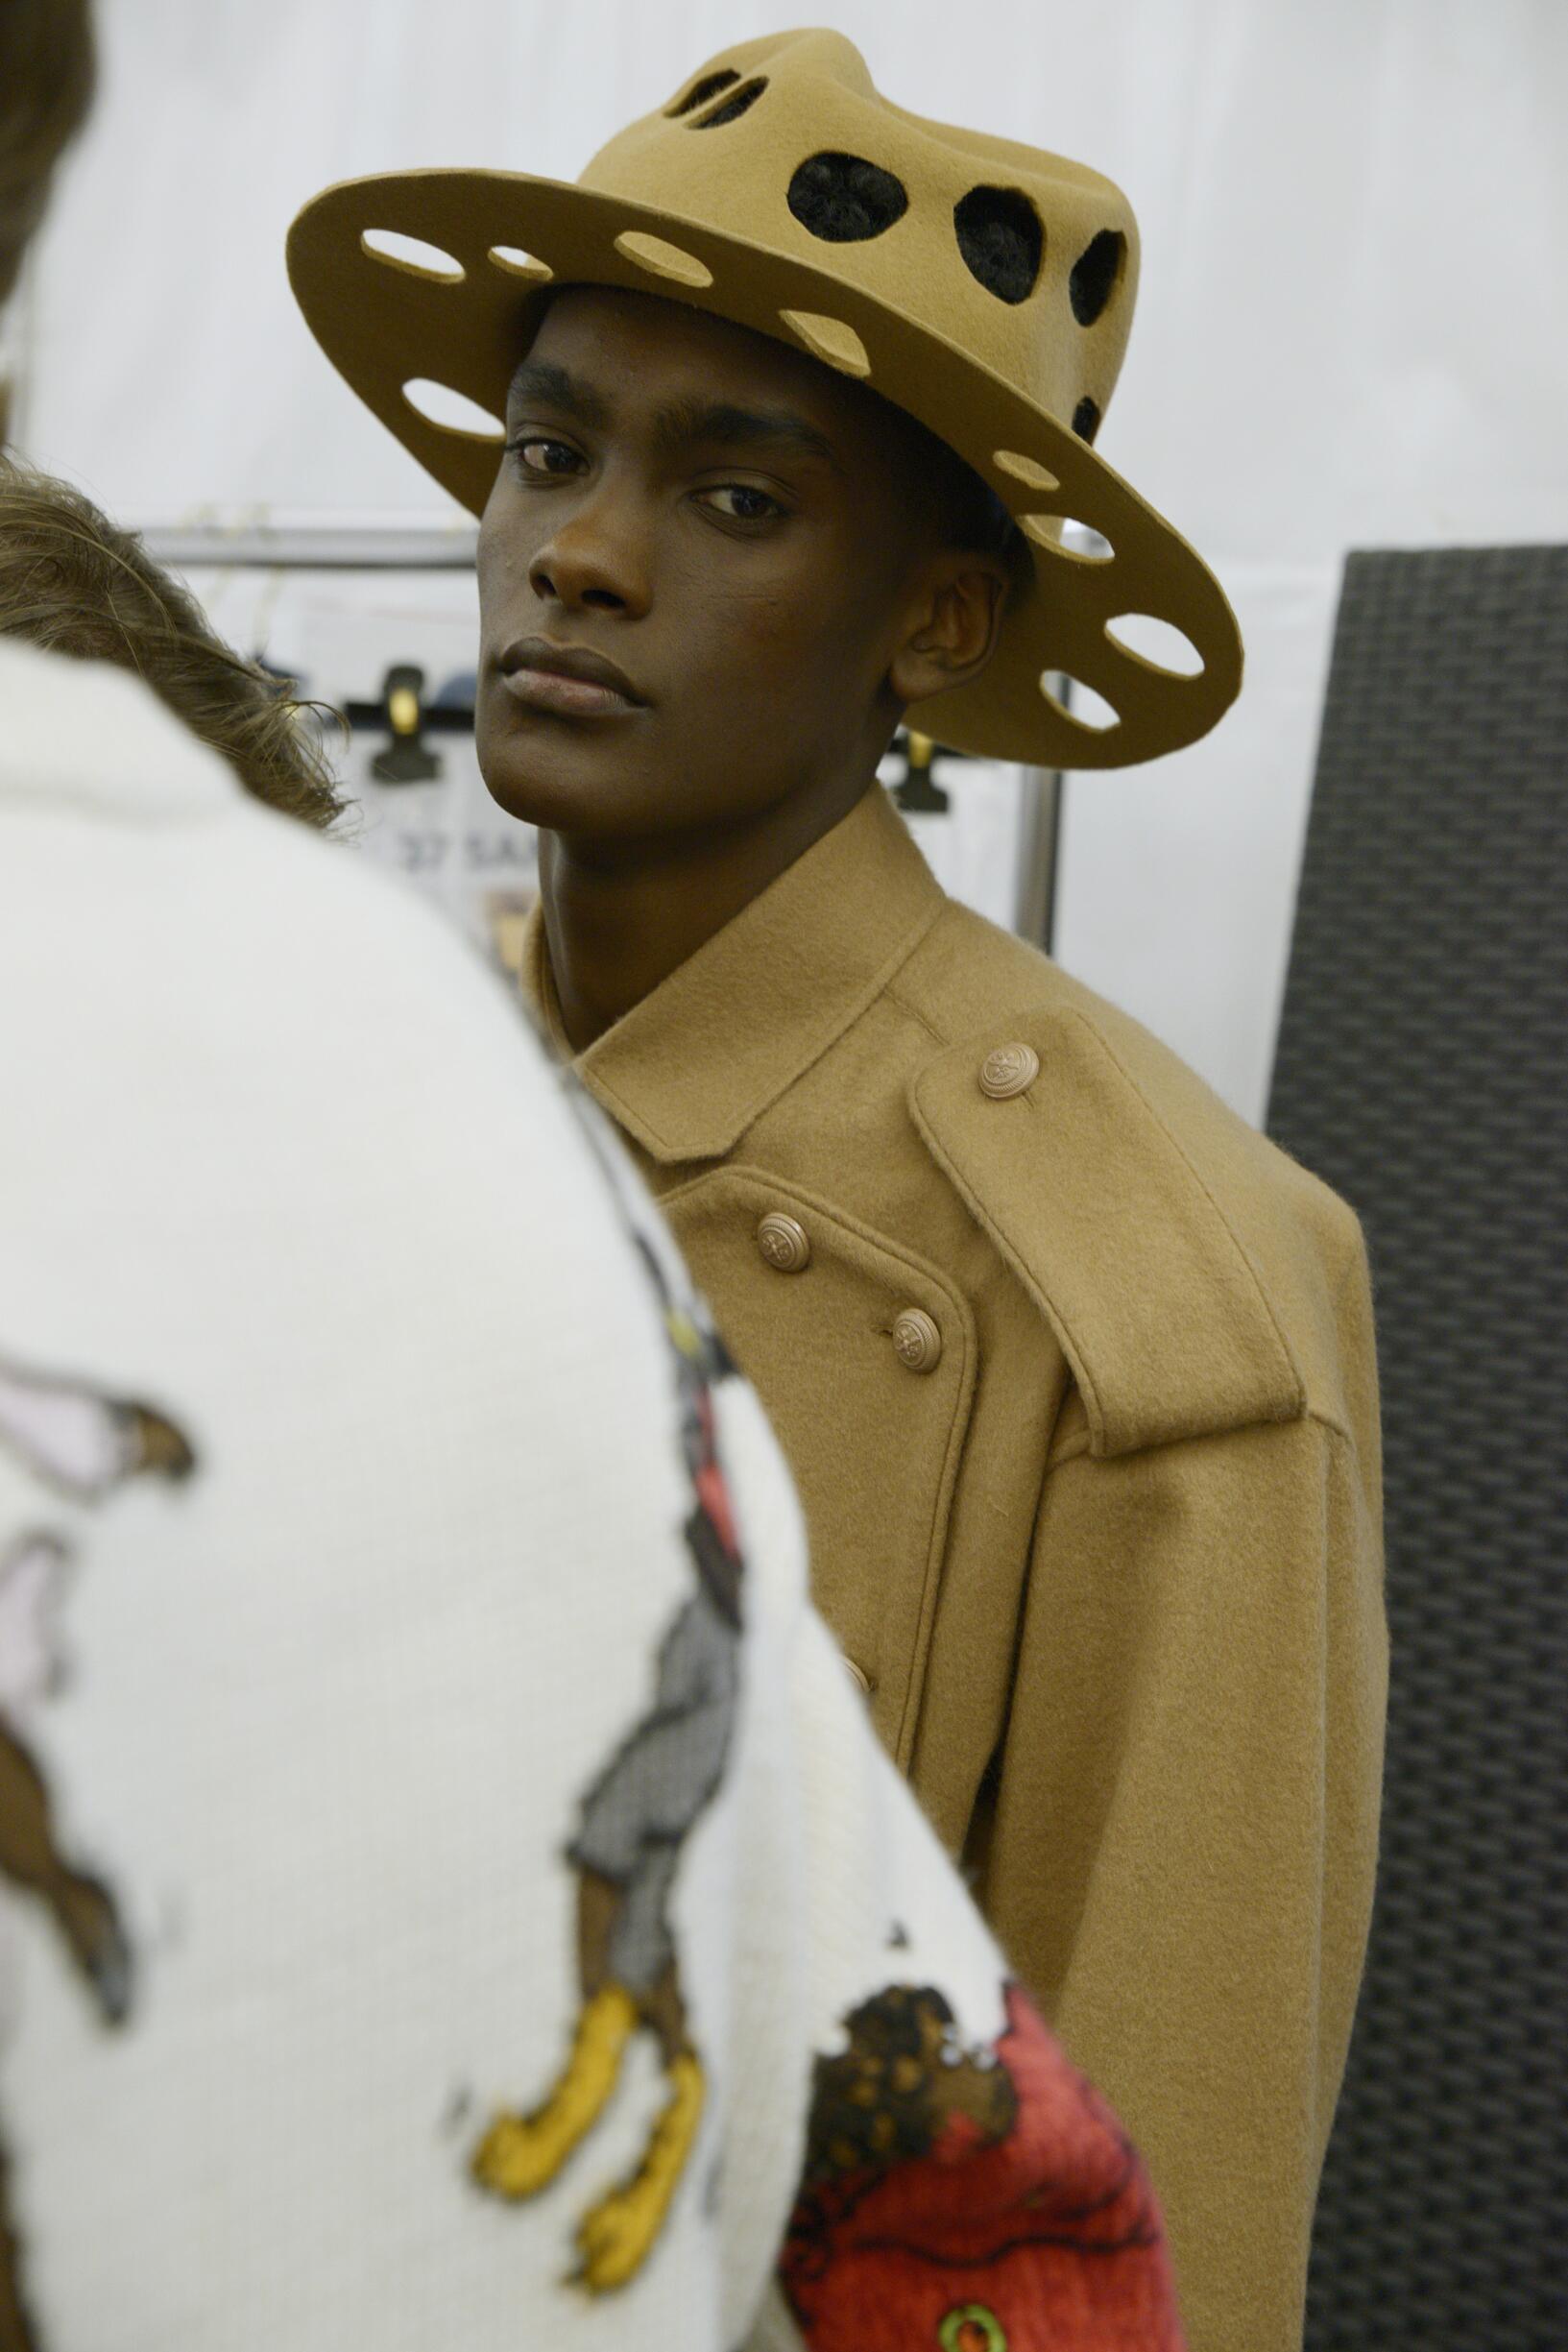 Backstage Louis Vuitton Fashion Trends 2019